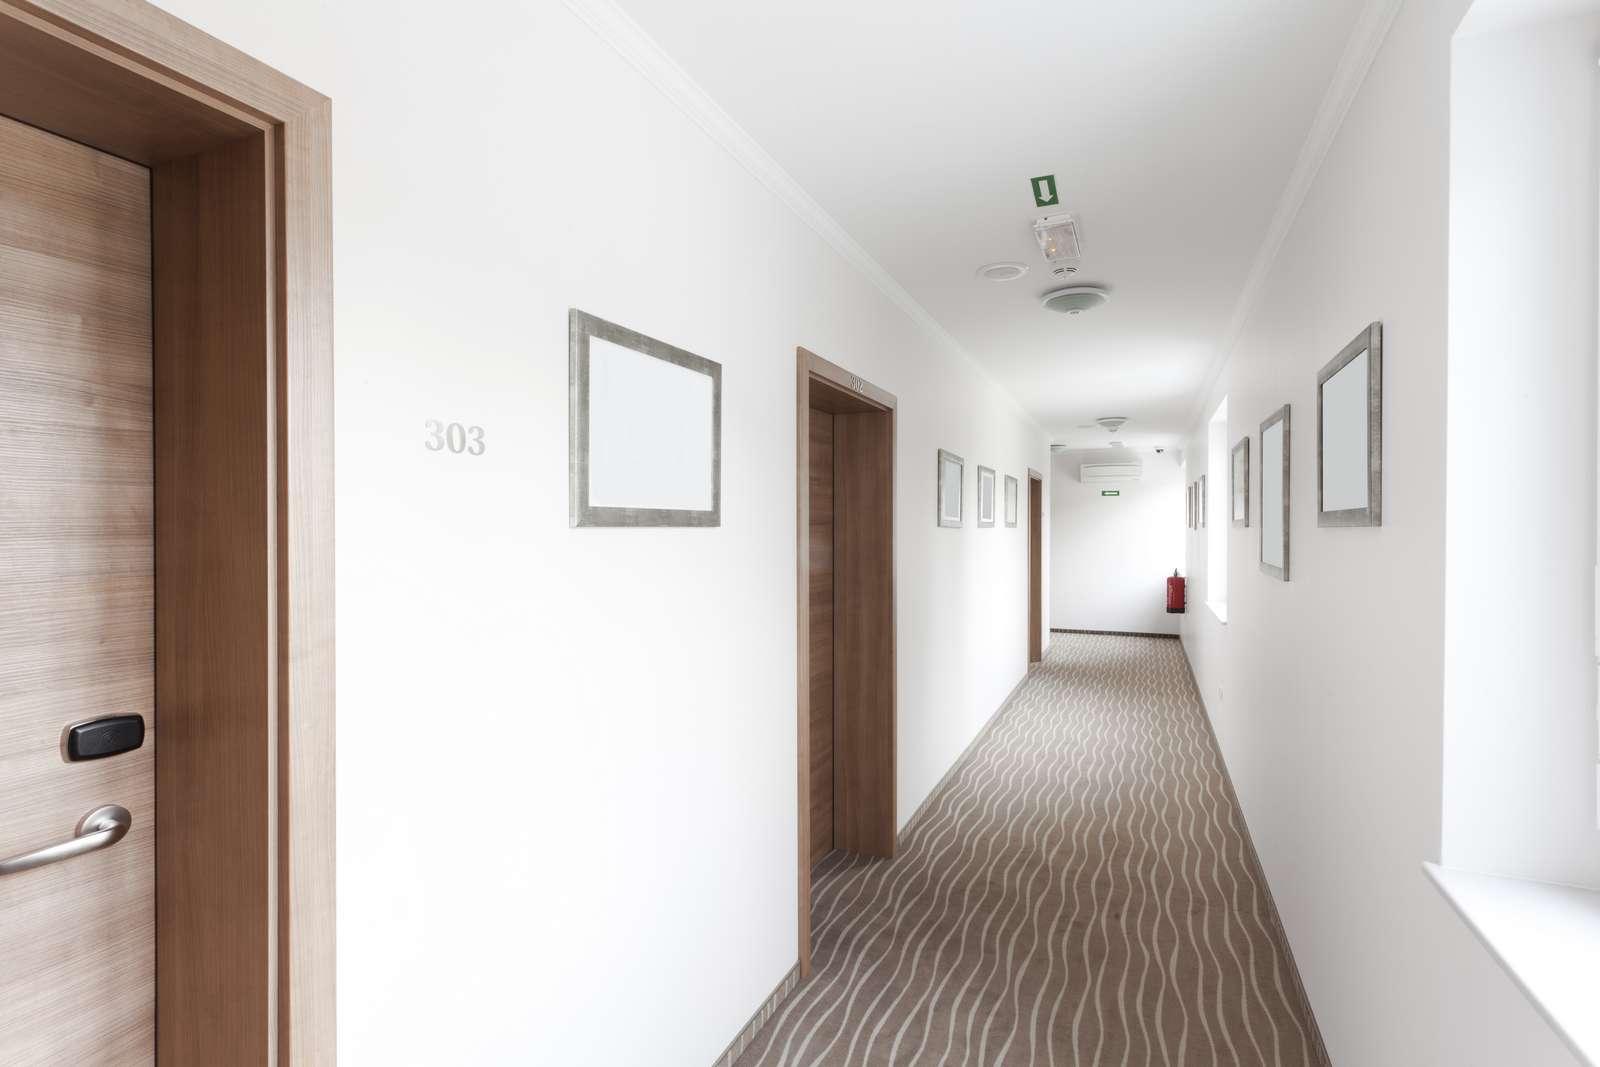 Smart Lock Bild 1 Hotelgang